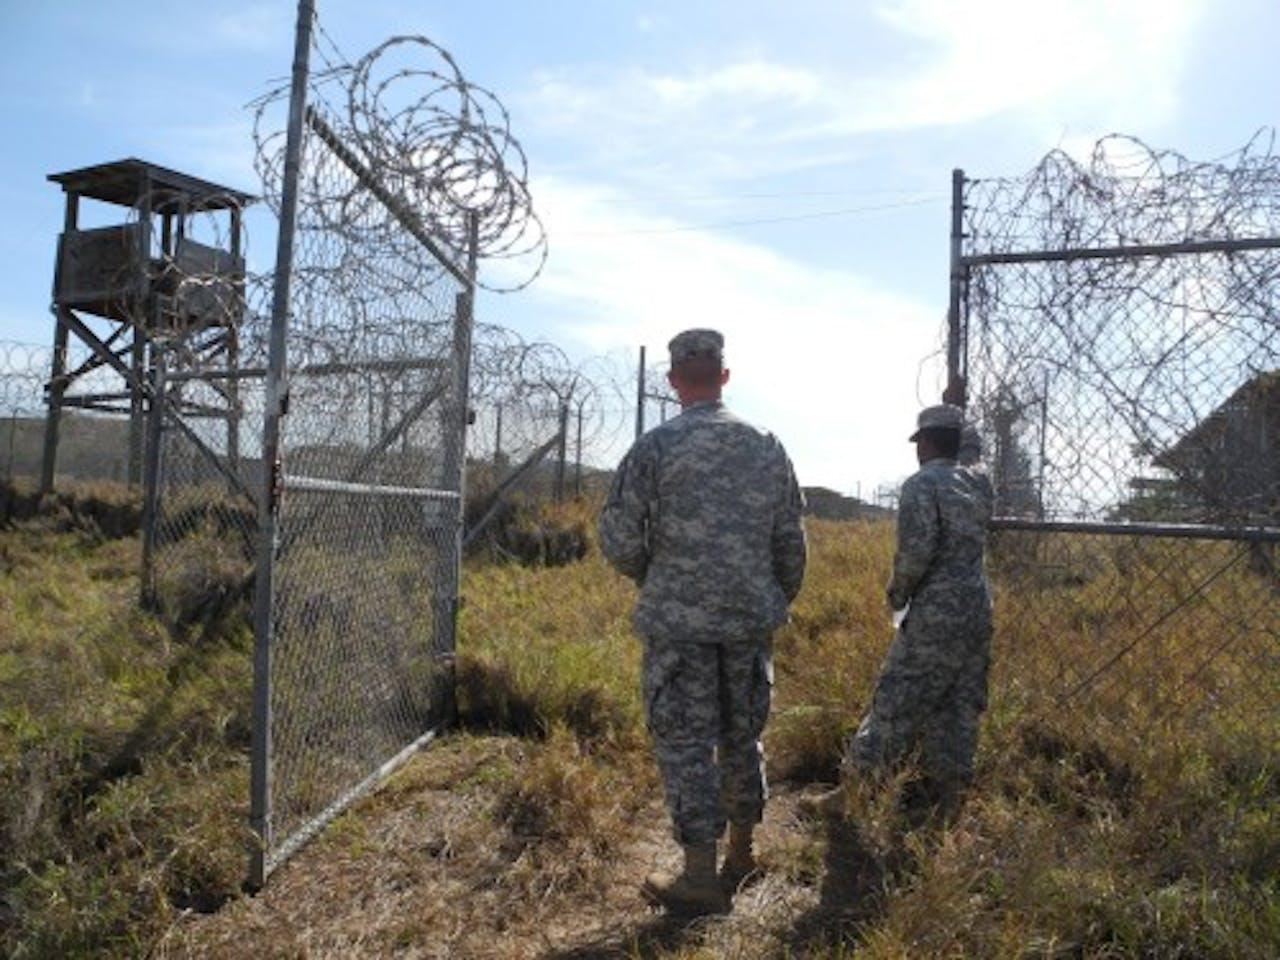 Archiefbeeld Guantánamo Bay (EPA)